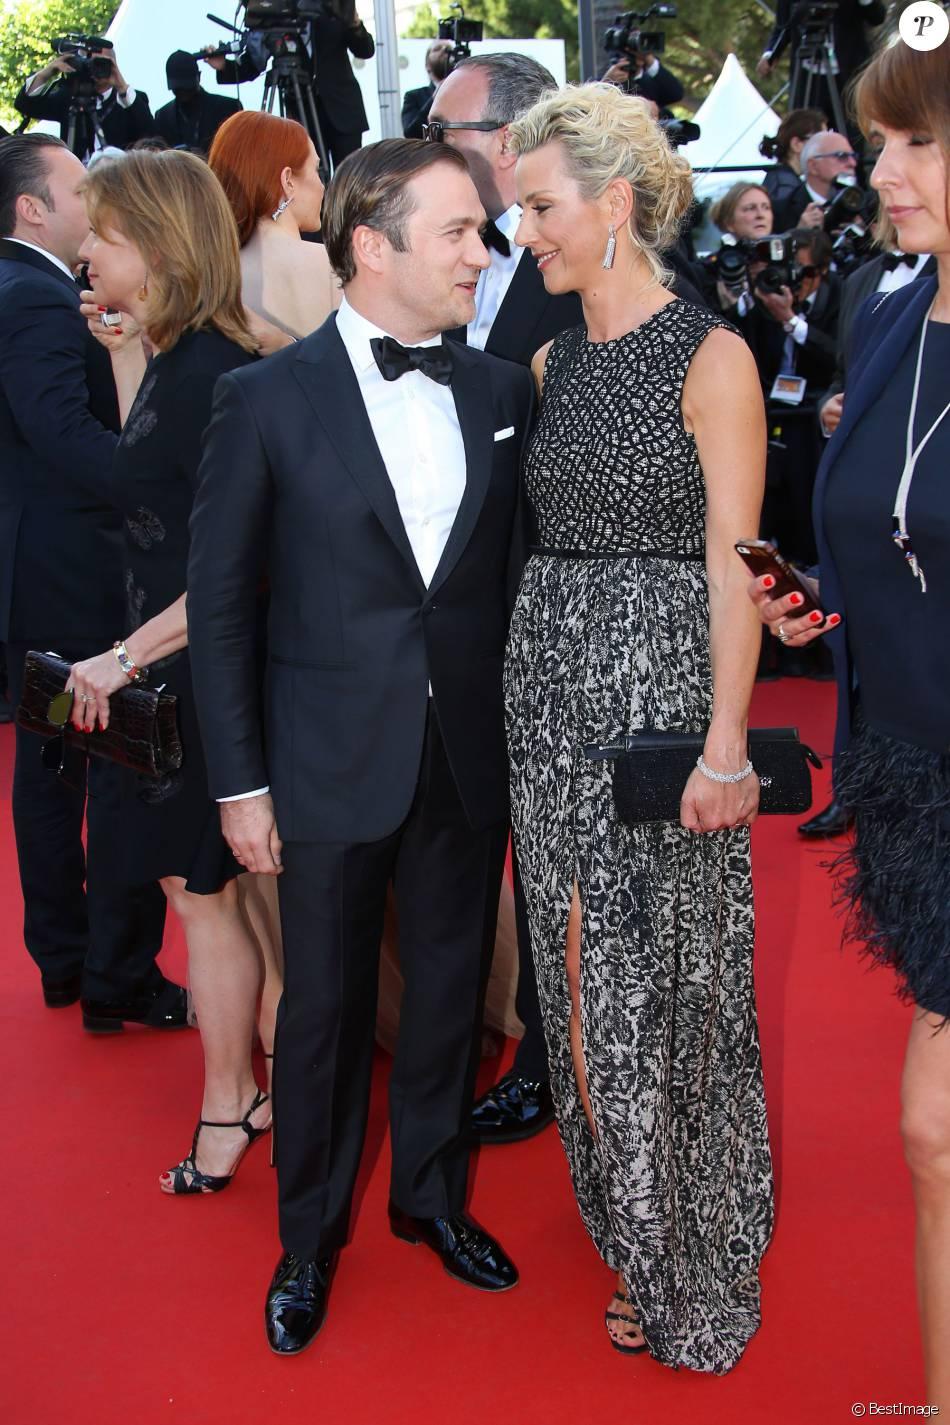 Cannes 2016 laurence ferrari so in love de son mari natacha polony